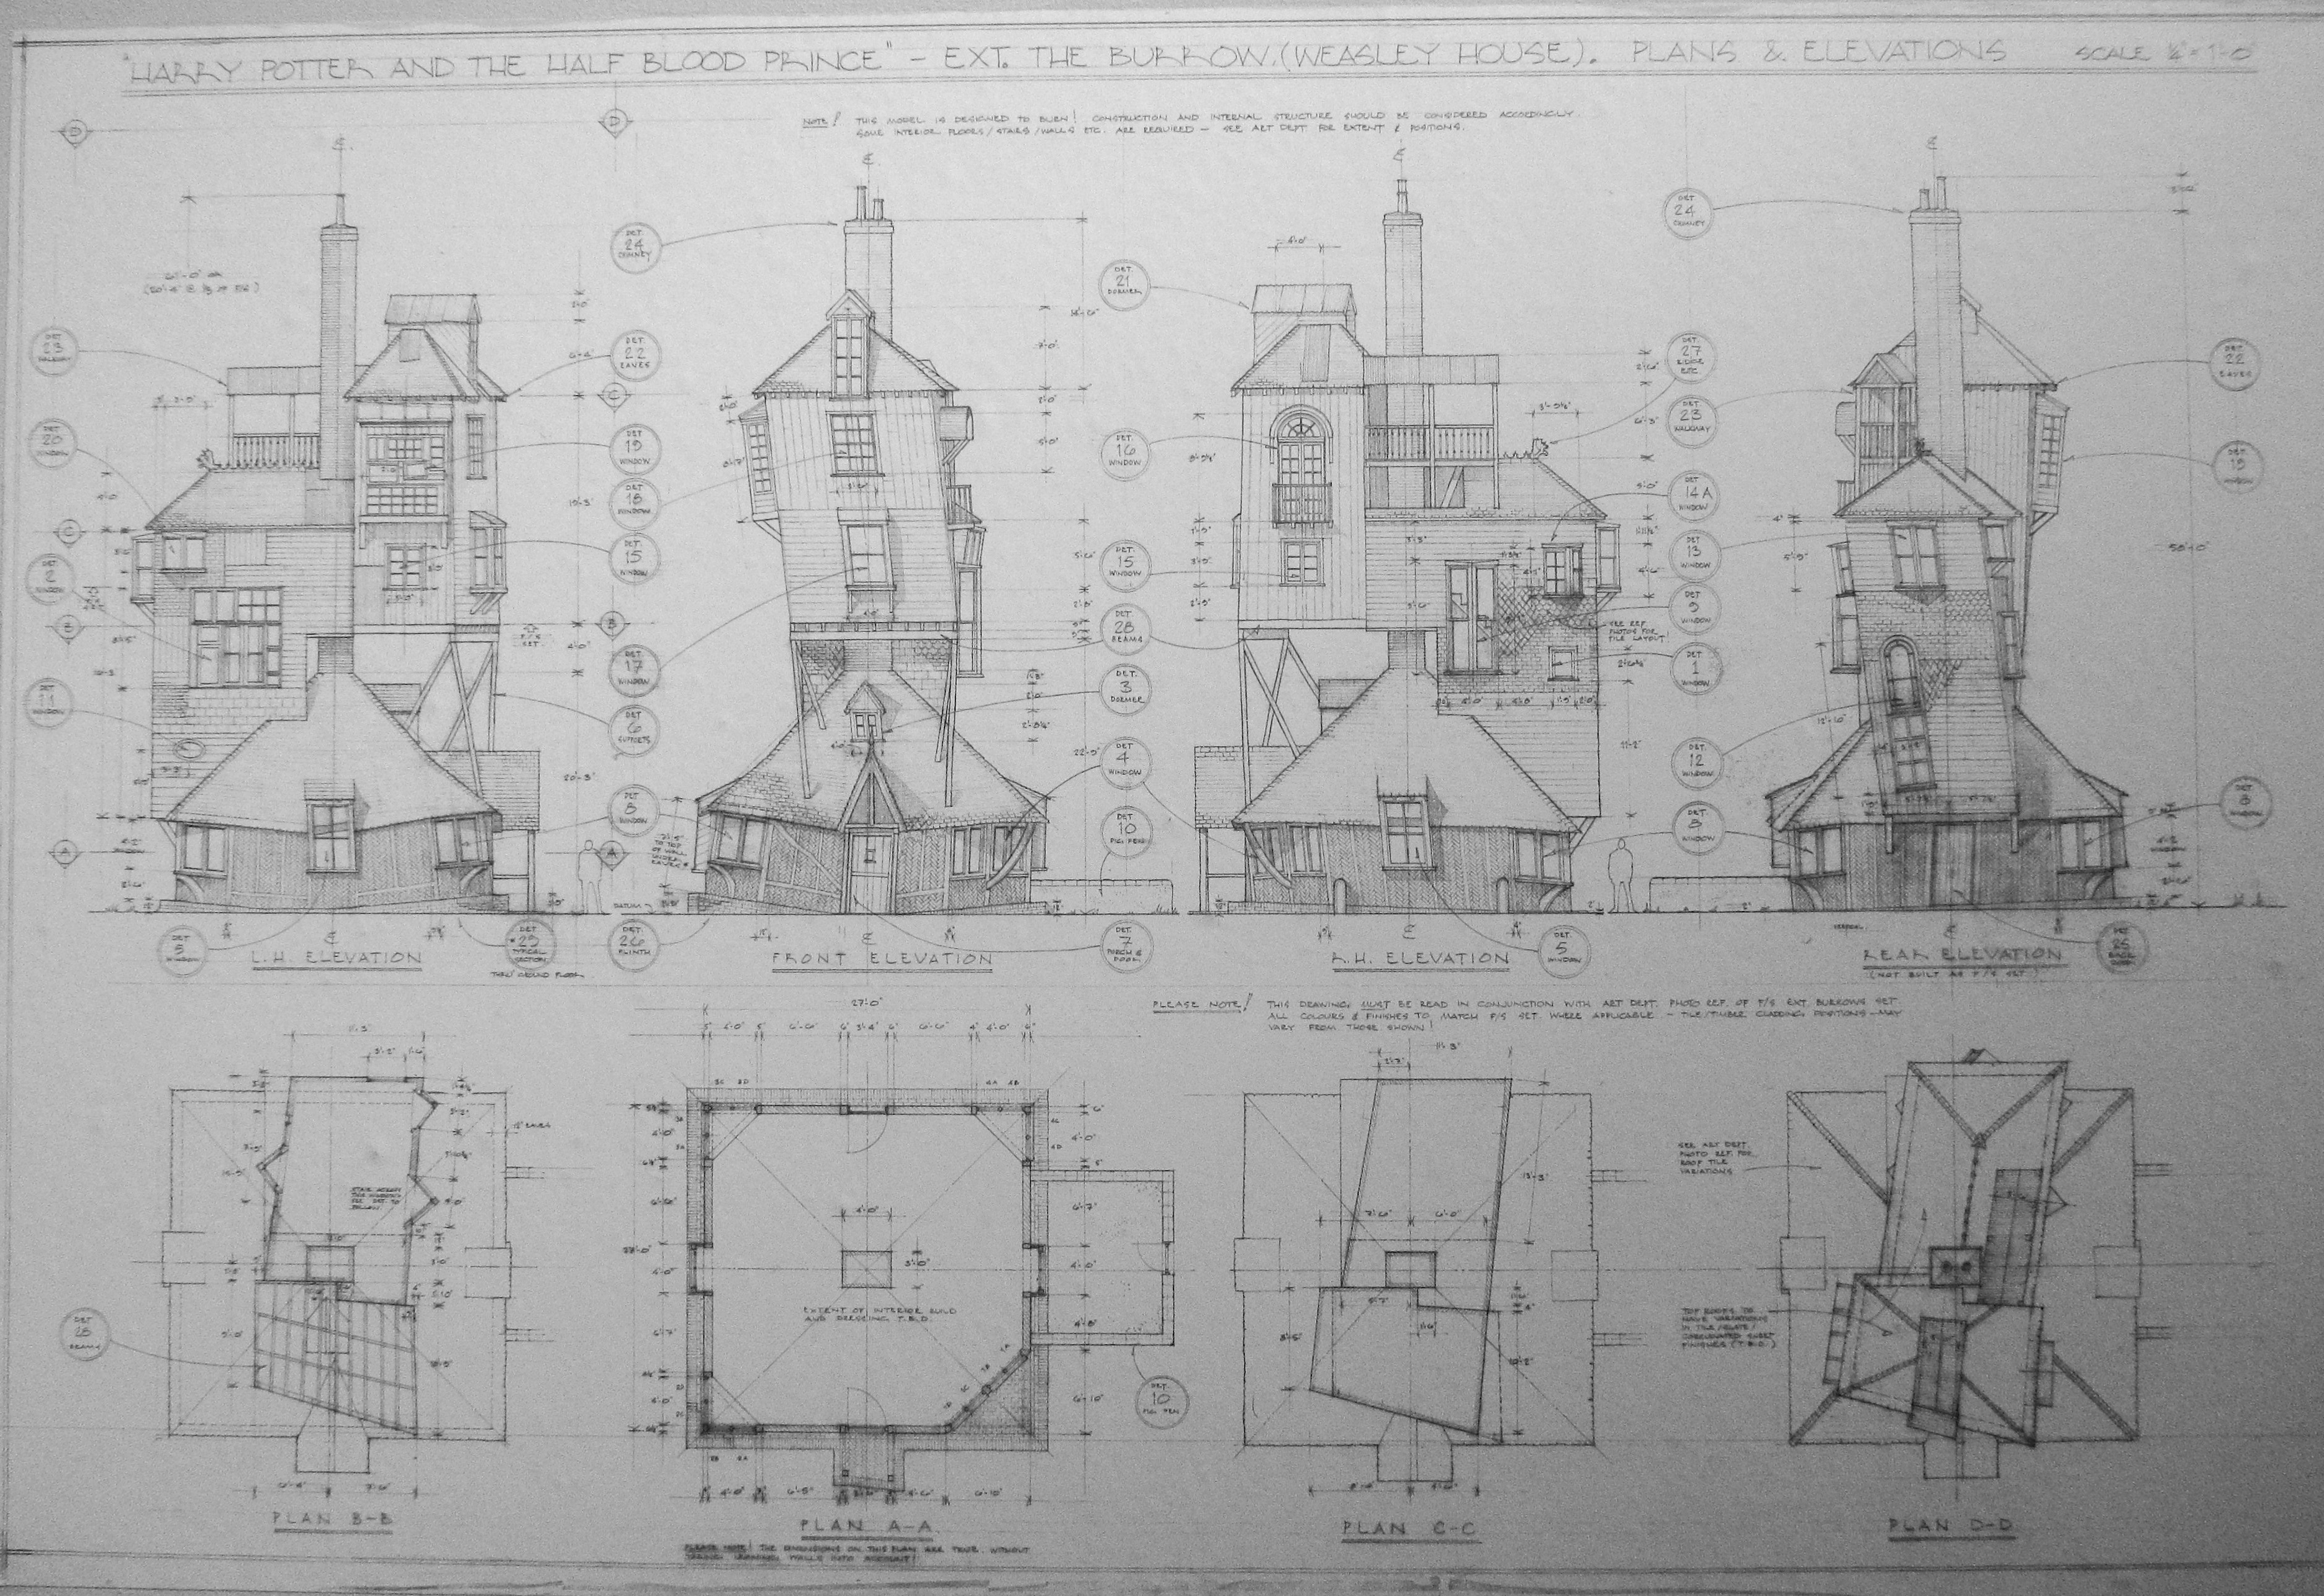 Harry potter stuart craig production designer design for film pinterest harry potter and films